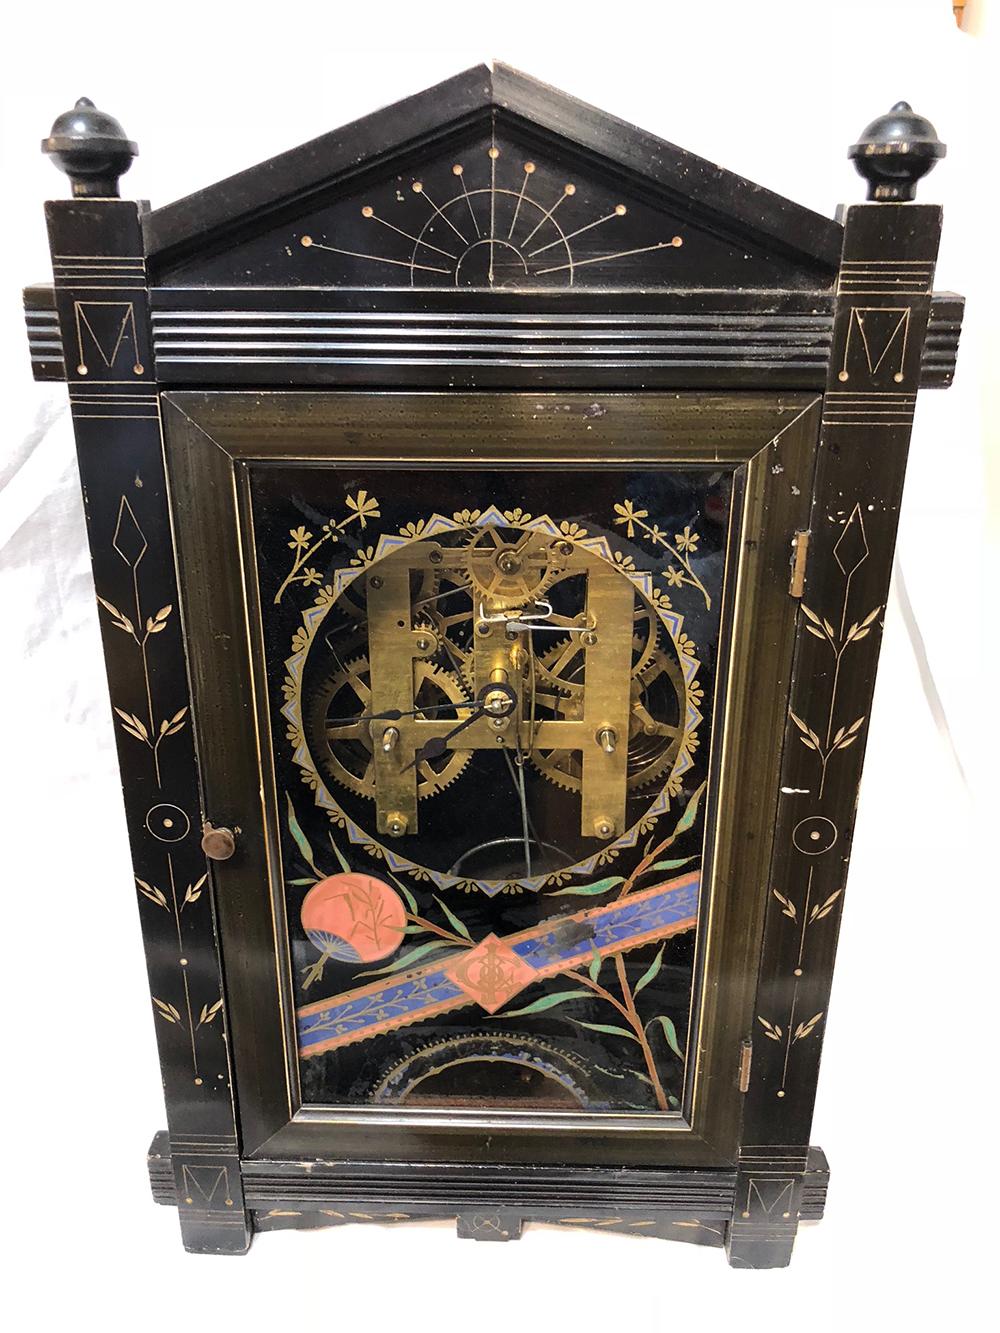 Jerome & Co. Shelf Clock